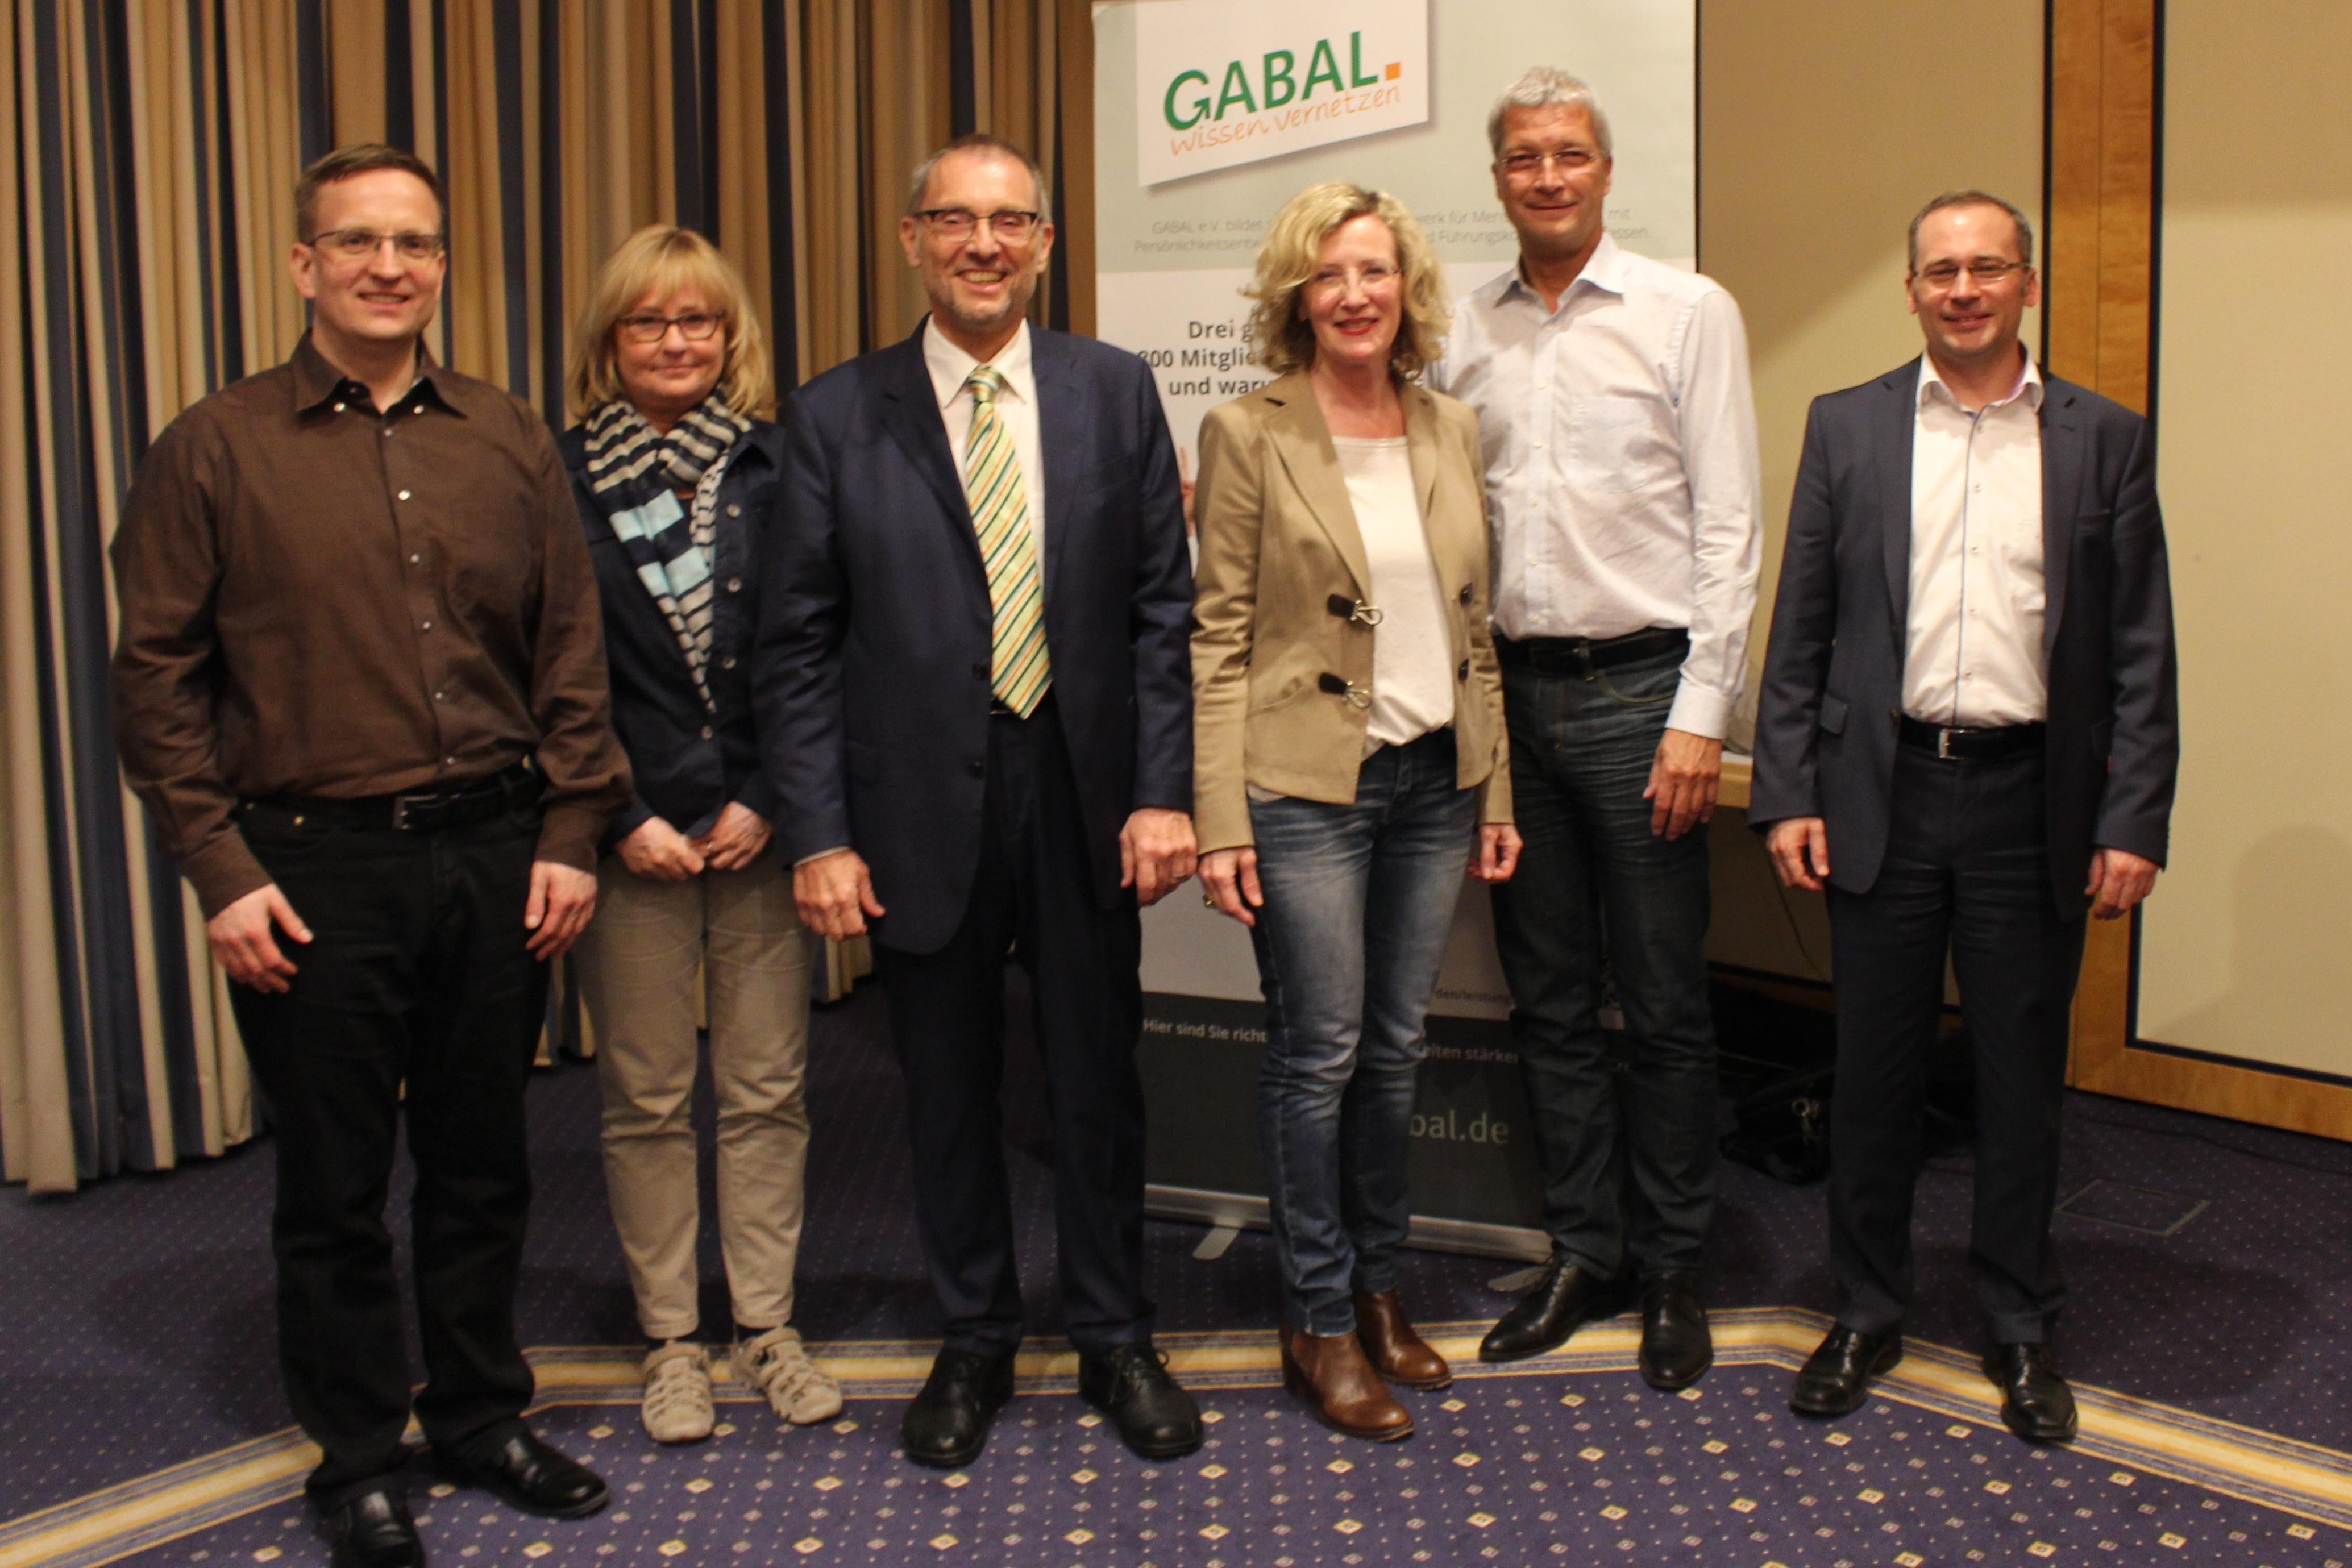 Neuer-GABAL-Vorstand-gewählt